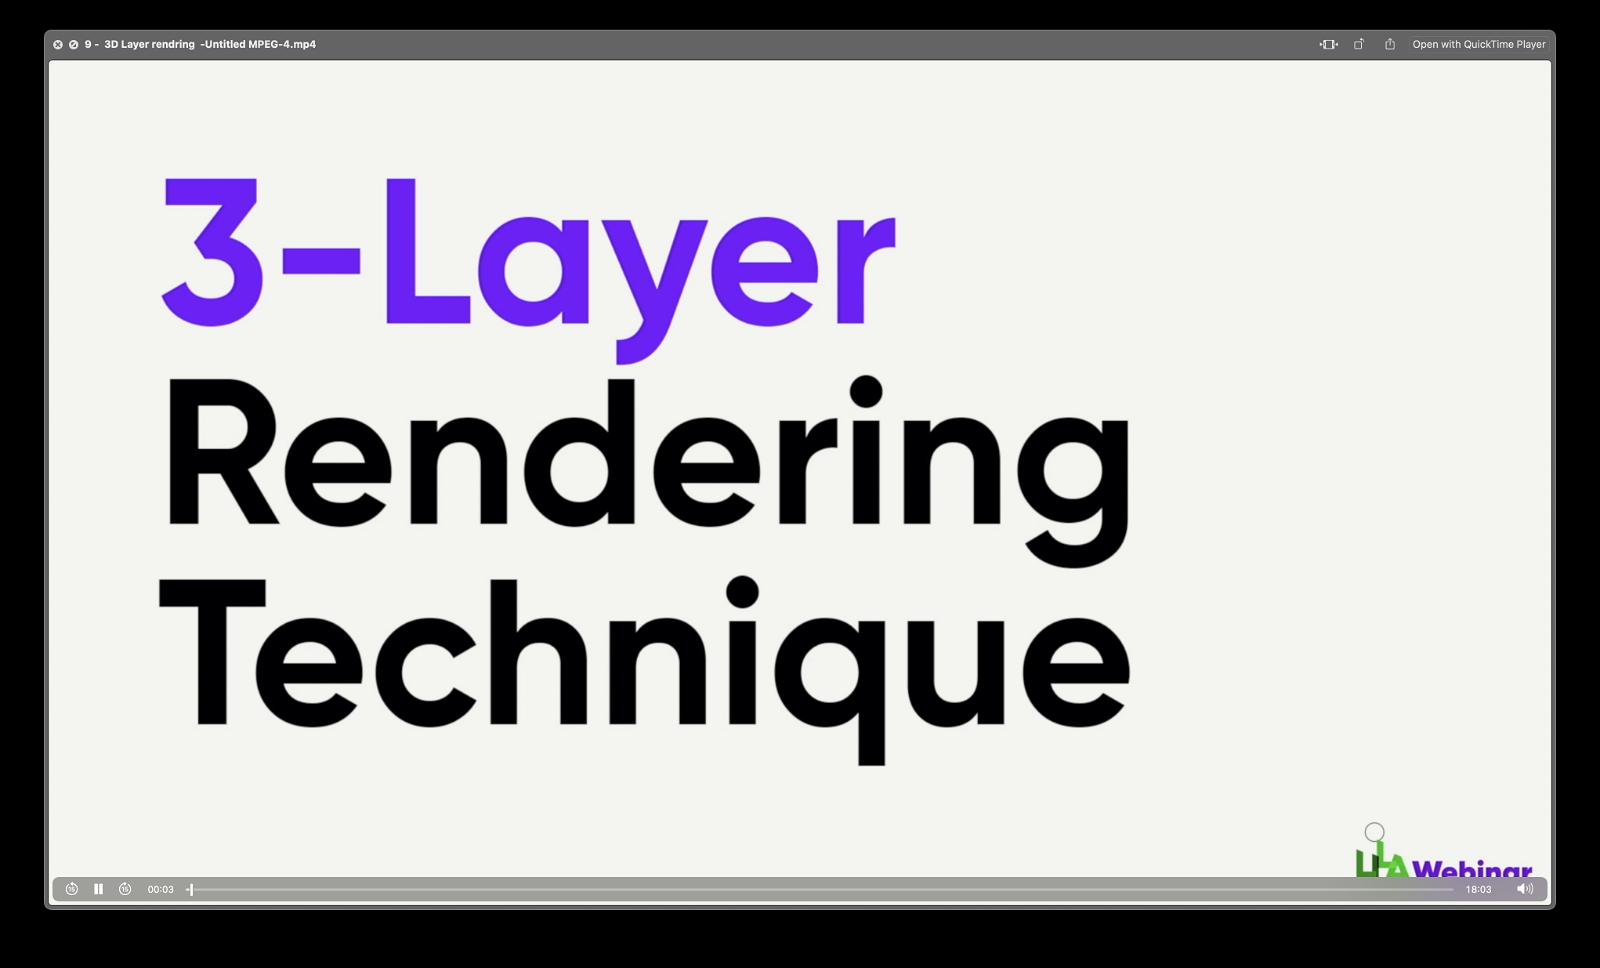 3d layer rendering technique